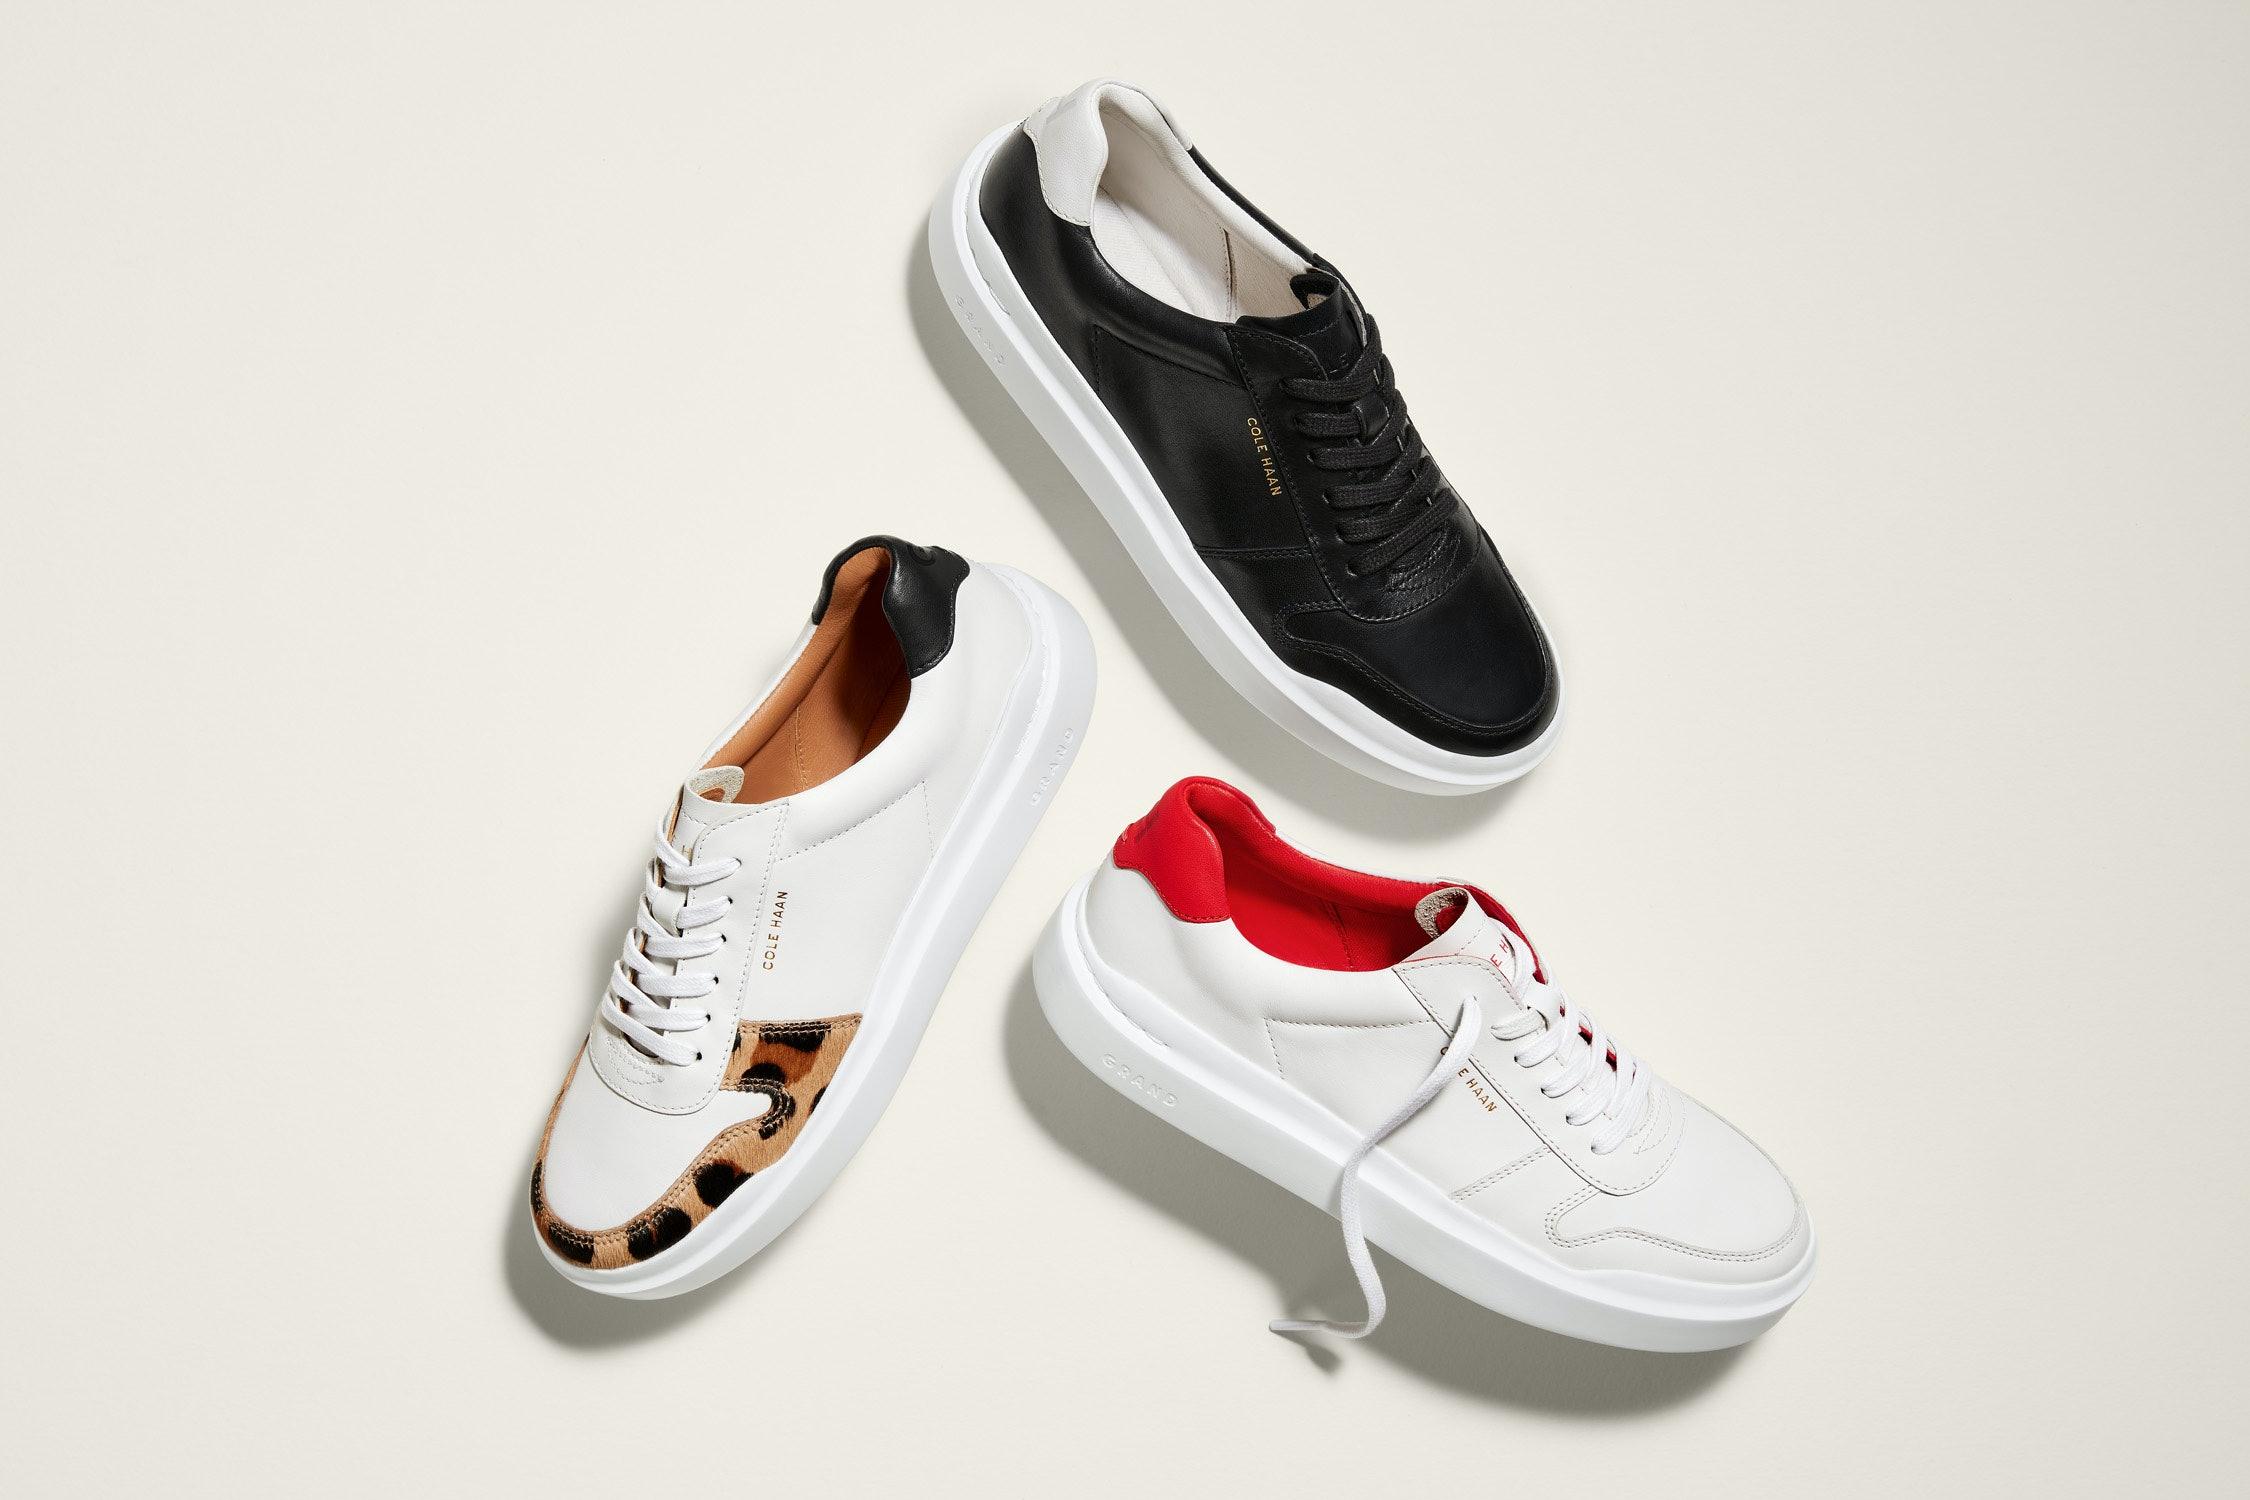 Cole Haan's New Sneakers Take Comfort